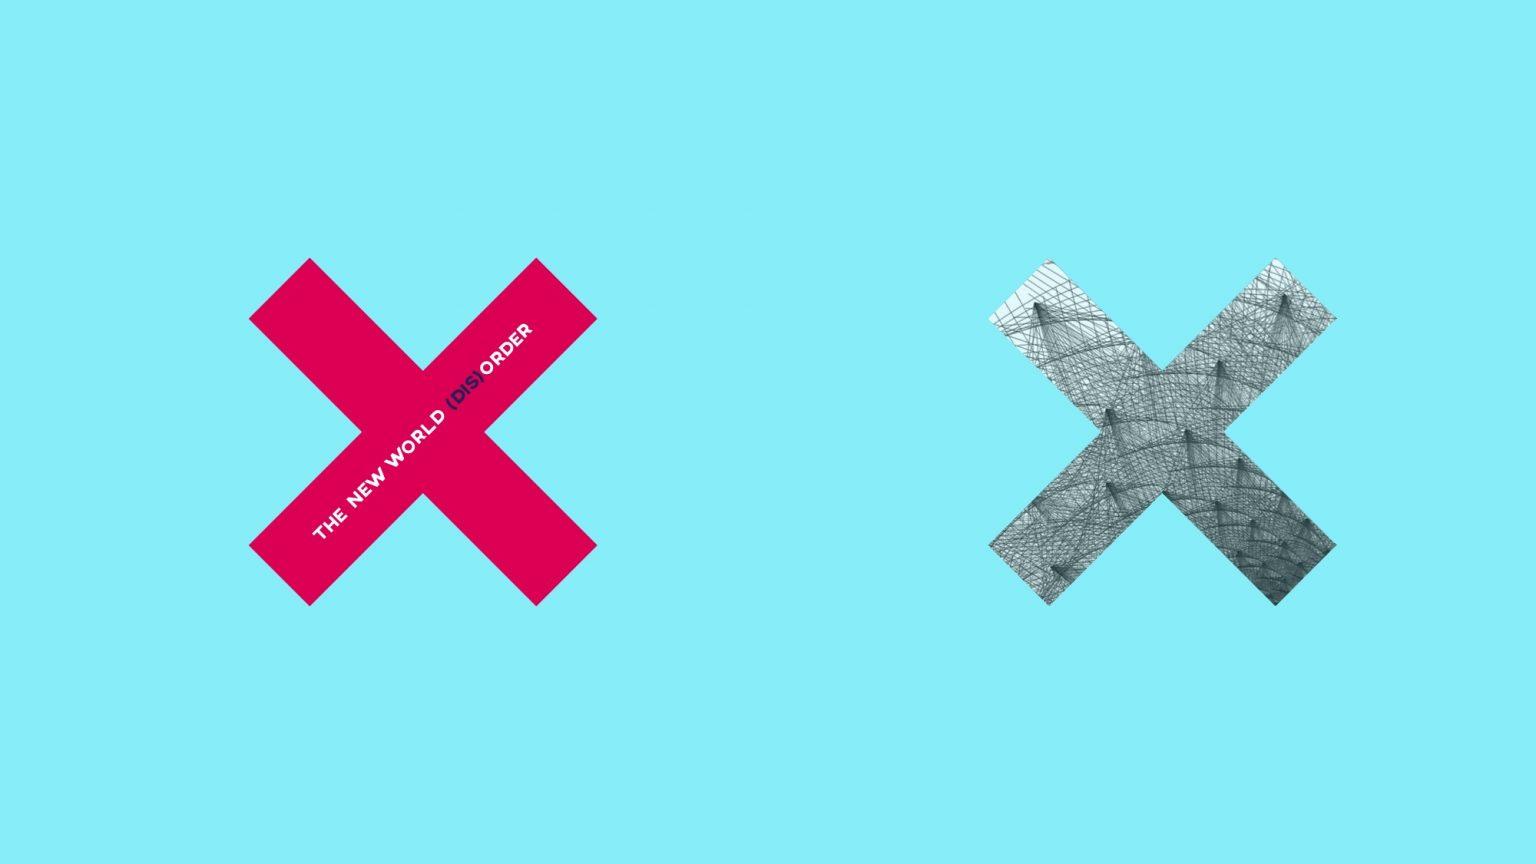 Amorphous_Digital design_Event branding_logo design_The Investment Forum